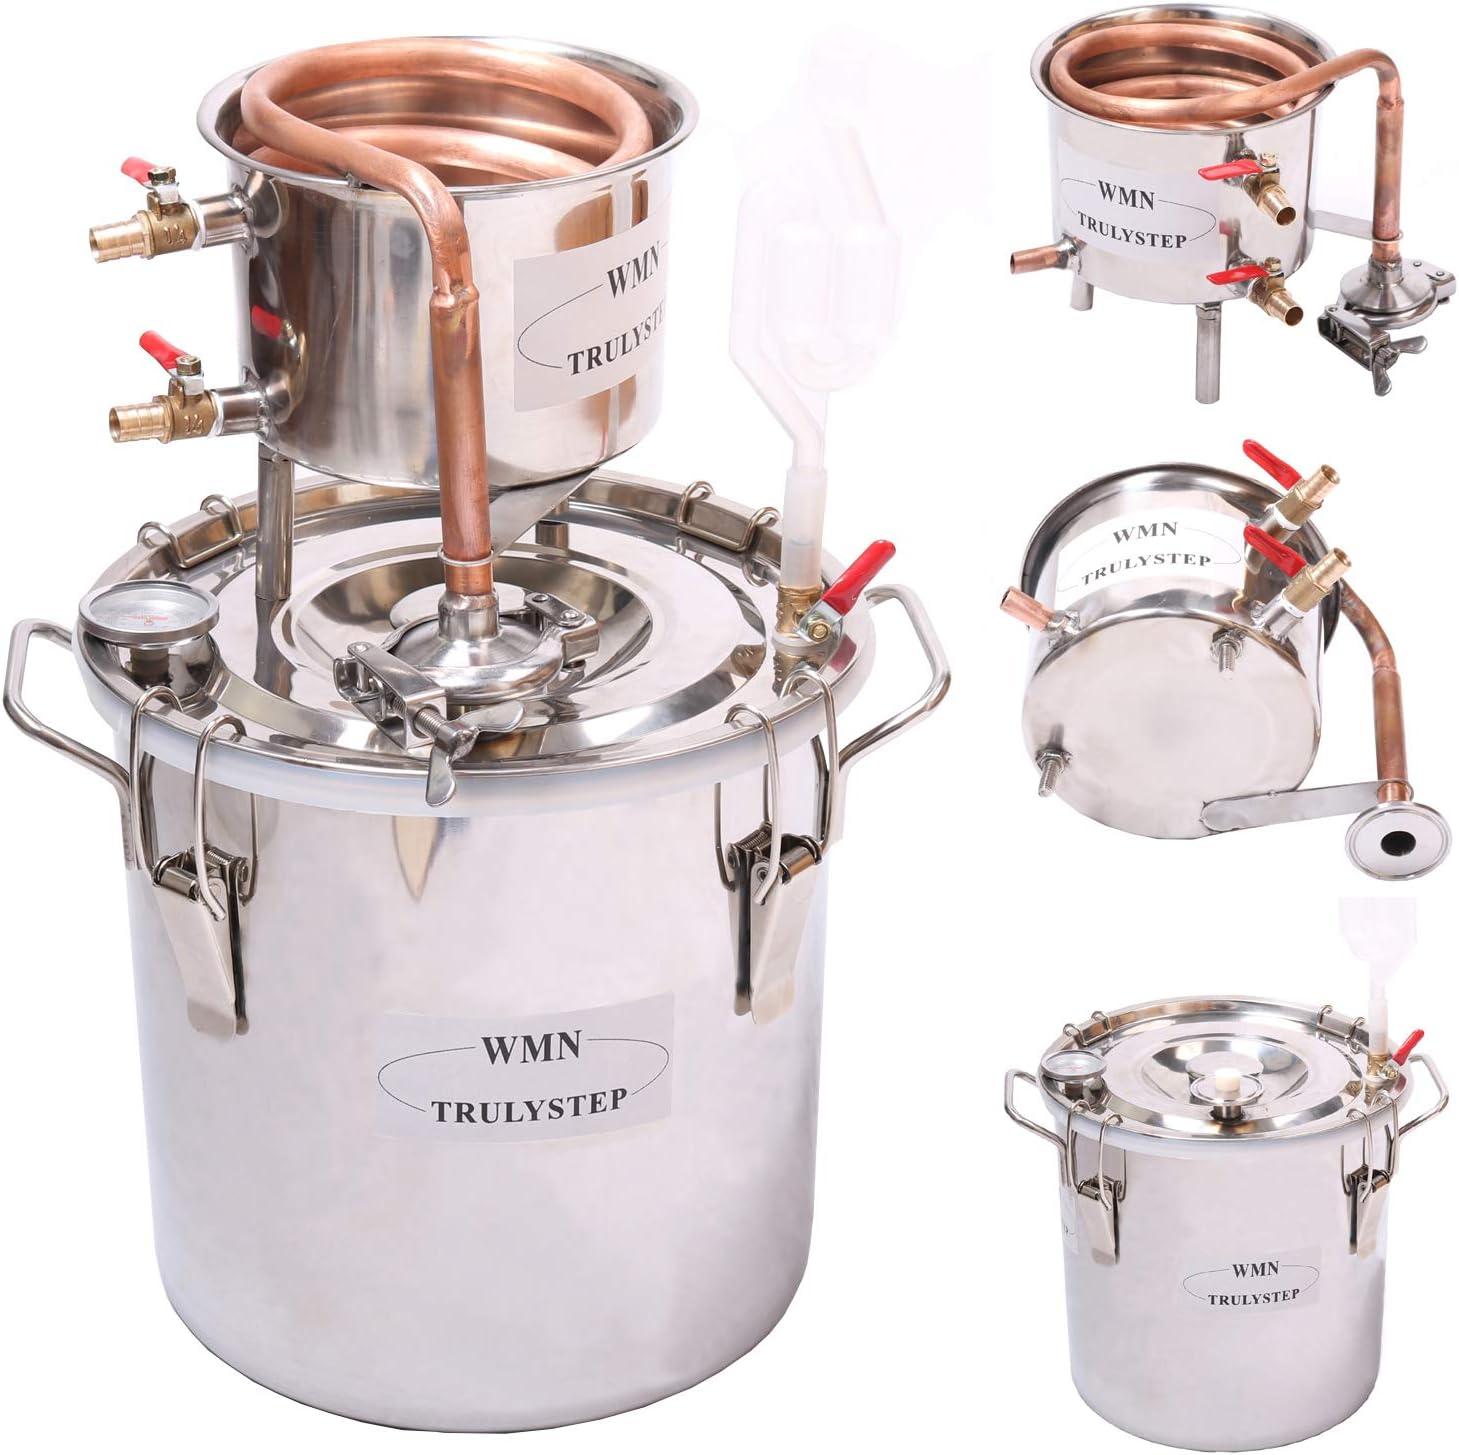 YUEWO DIY Copper Moonshine Still 10L/12L/20L/30L Home Distiller Alcohol Still Distilling Wine Making Homebrewing Boiler Thumper Keg (3 Gal 12 L)